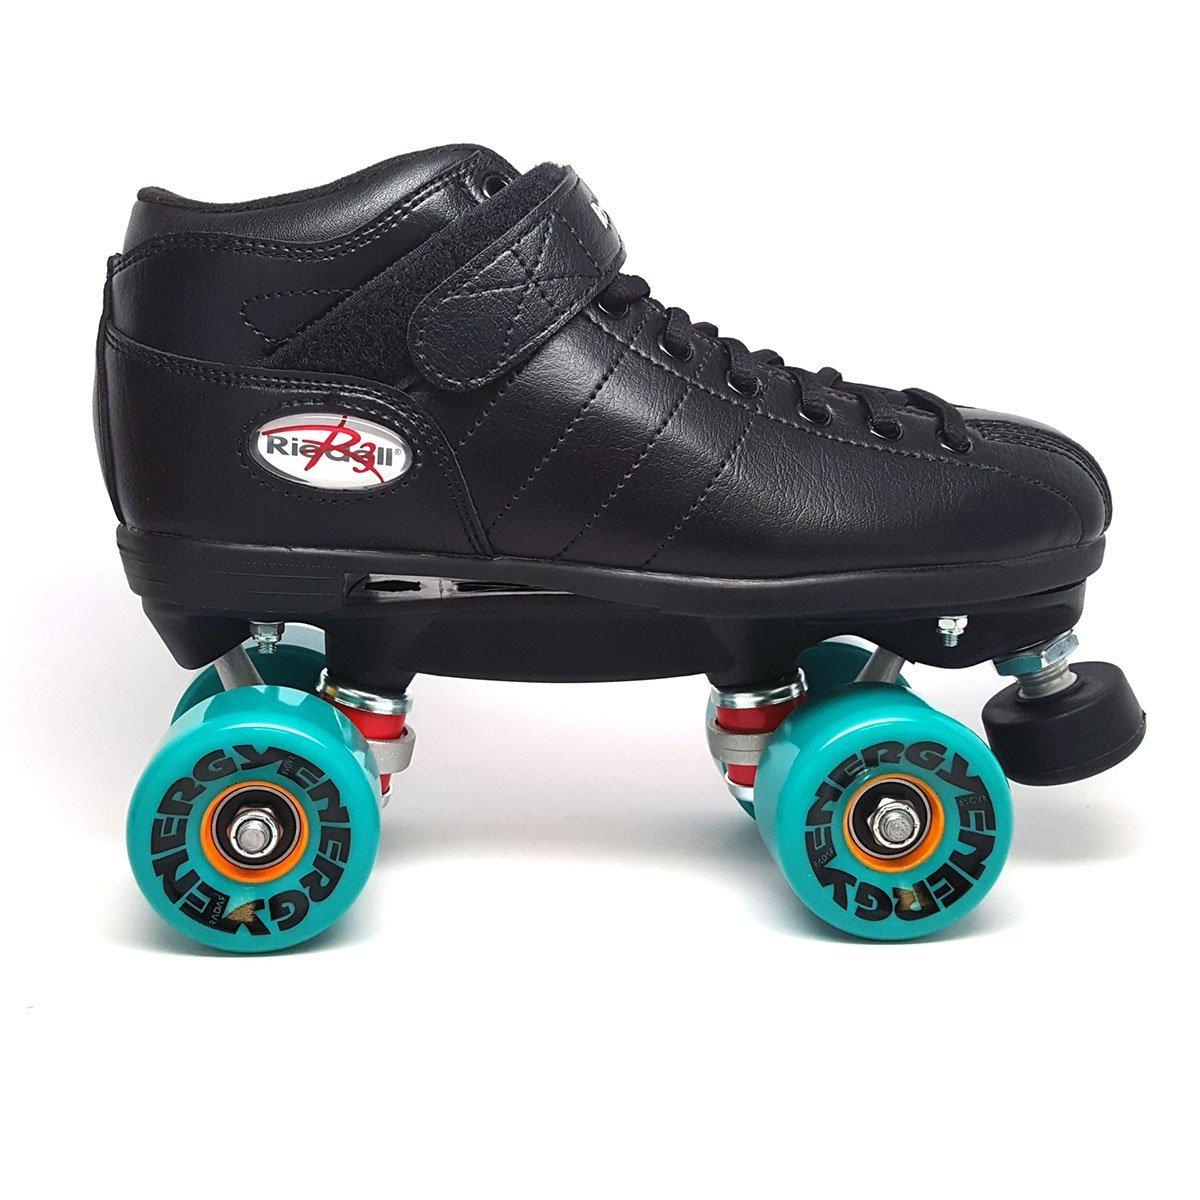 Roller skates helmet - Amazon Com Riedell R3 Outdoor Energy Roller Skates Sports Outdoors